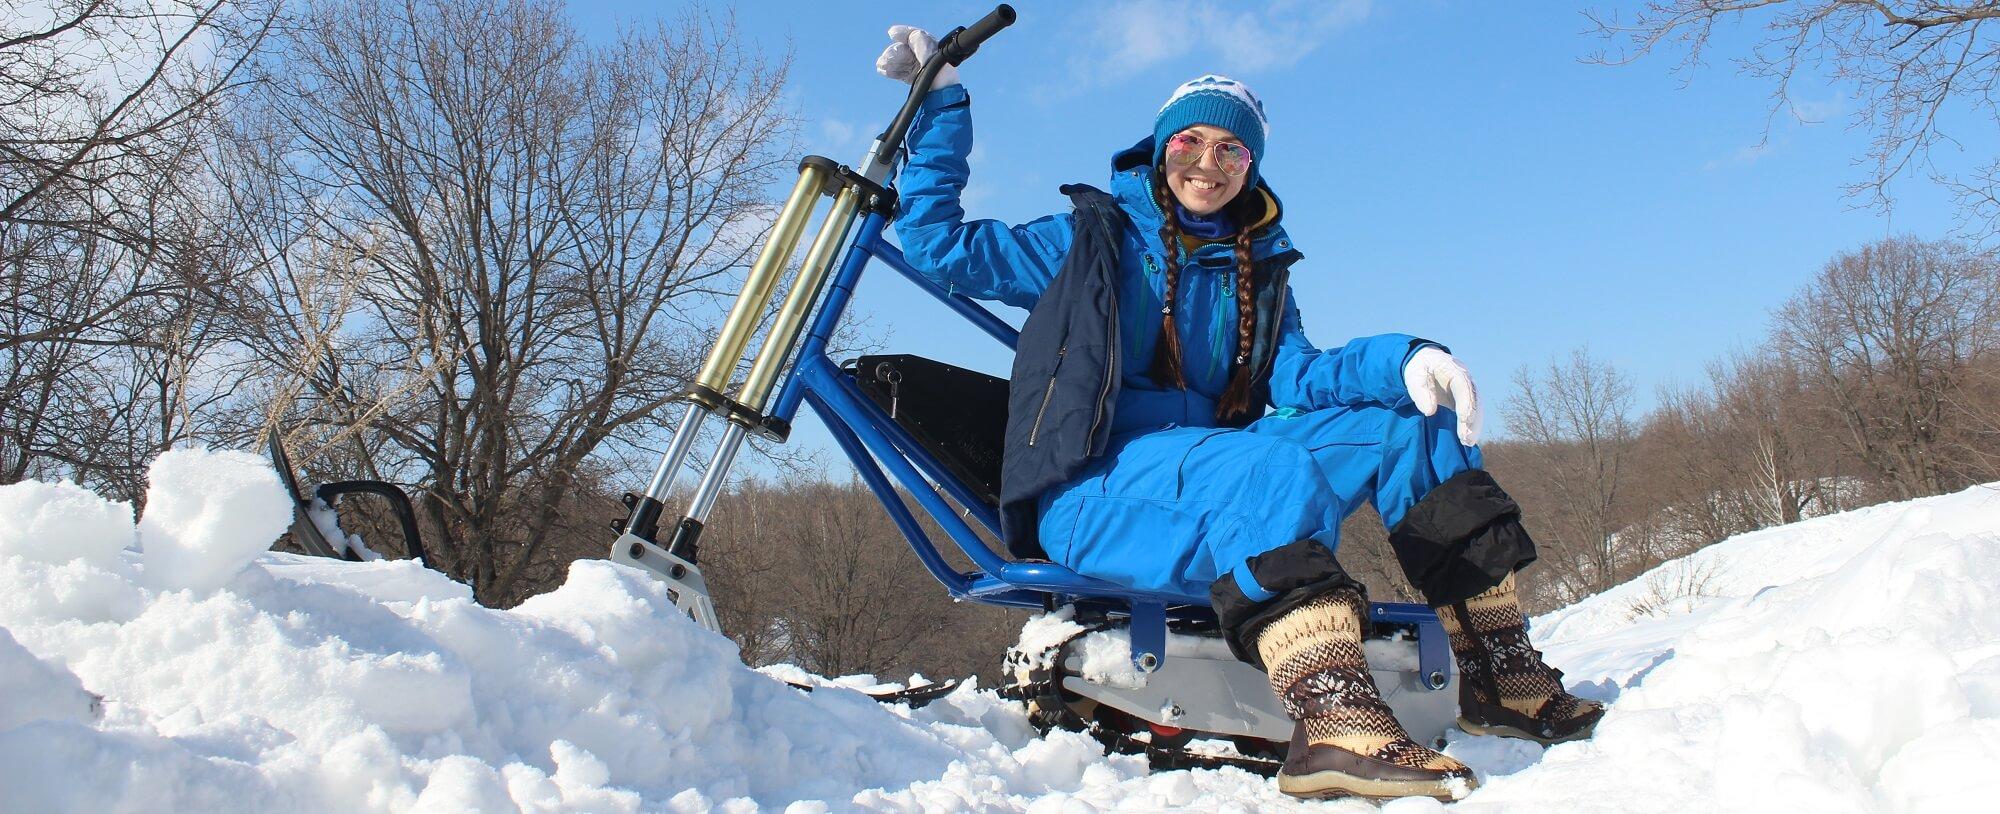 Elecrtric-snowbike_slider_2